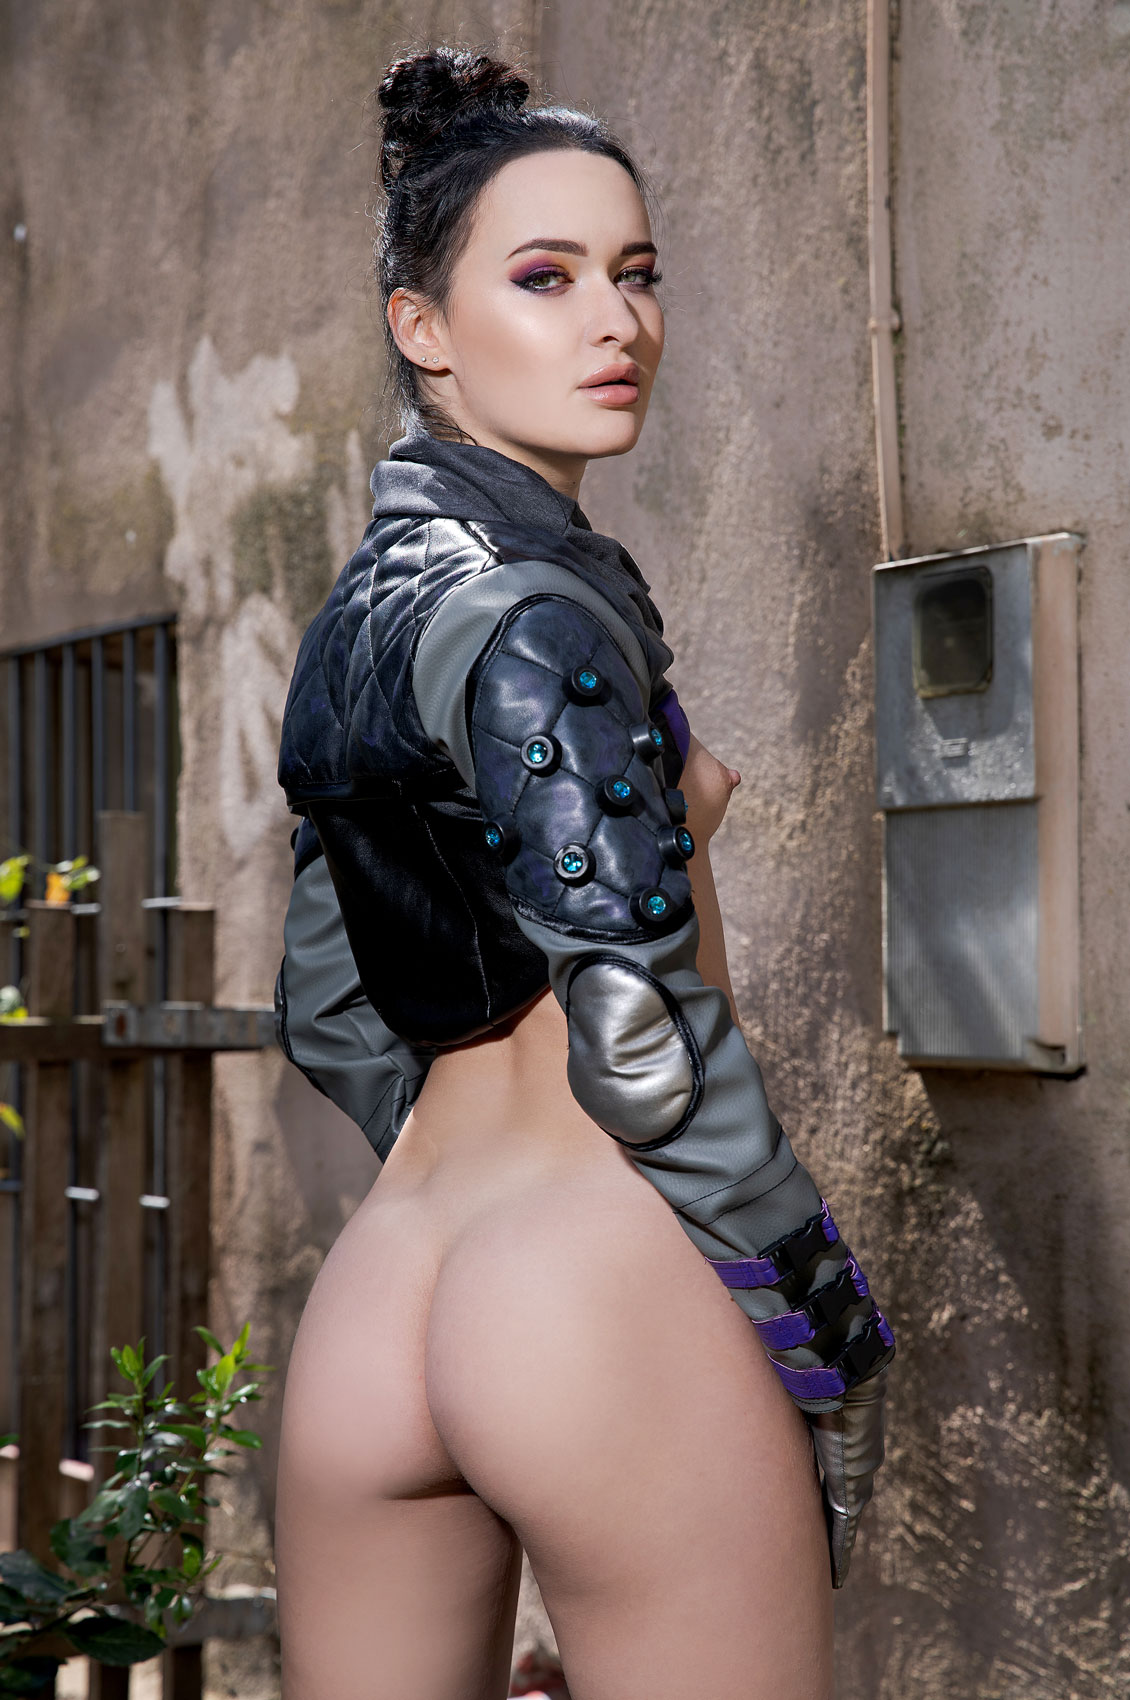 Sasha Sparrow's VR Porn Videos, Bio & Free Nude Pics